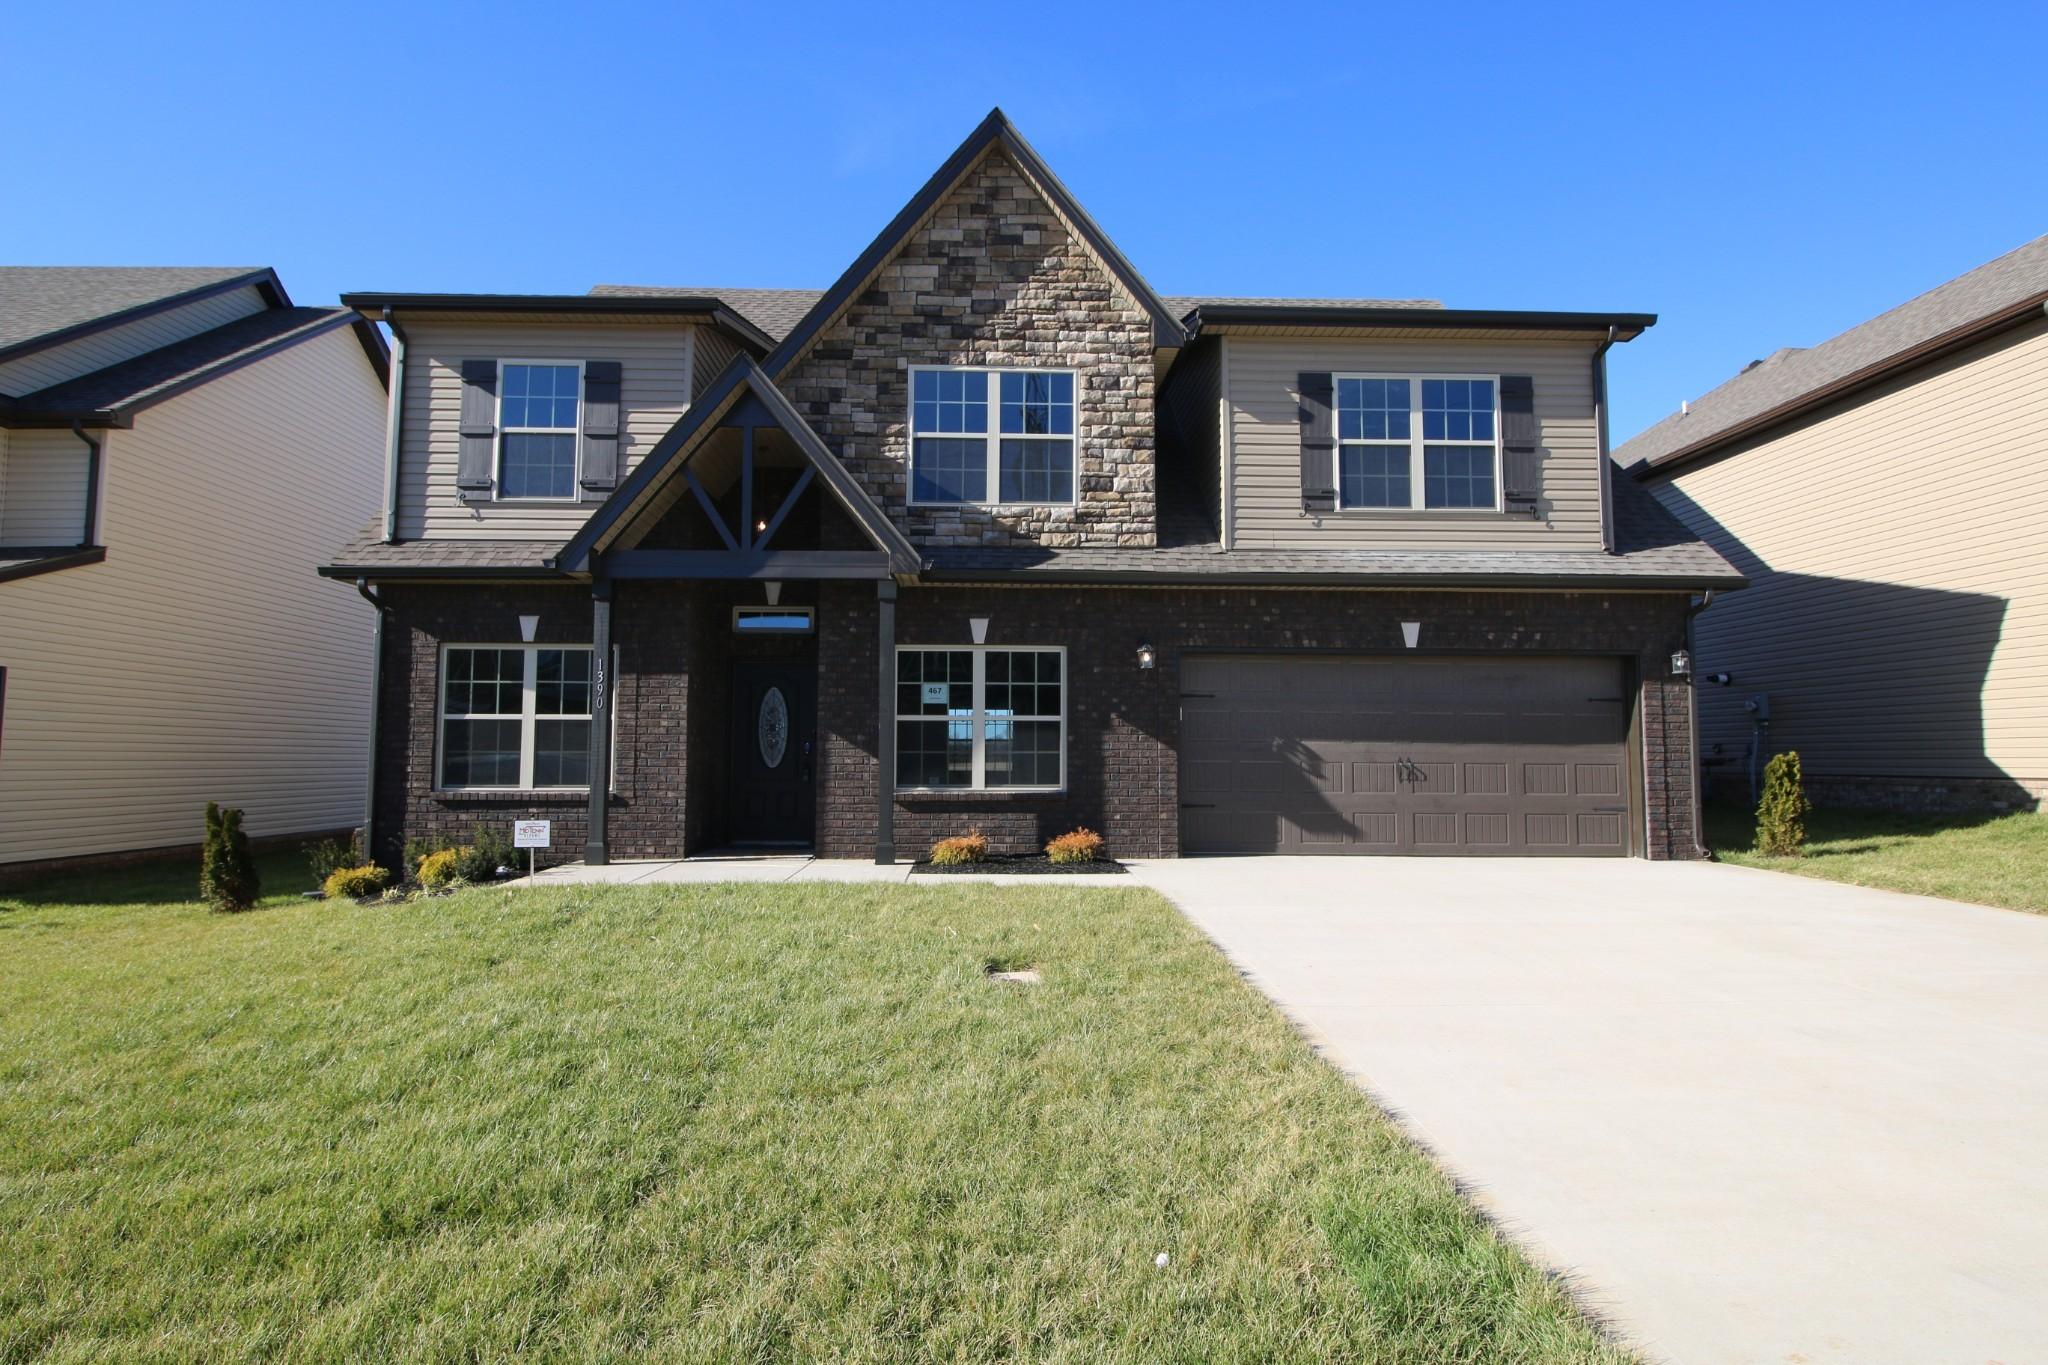 467 Summerfield, Clarksville, TN 37040 - Clarksville, TN real estate listing